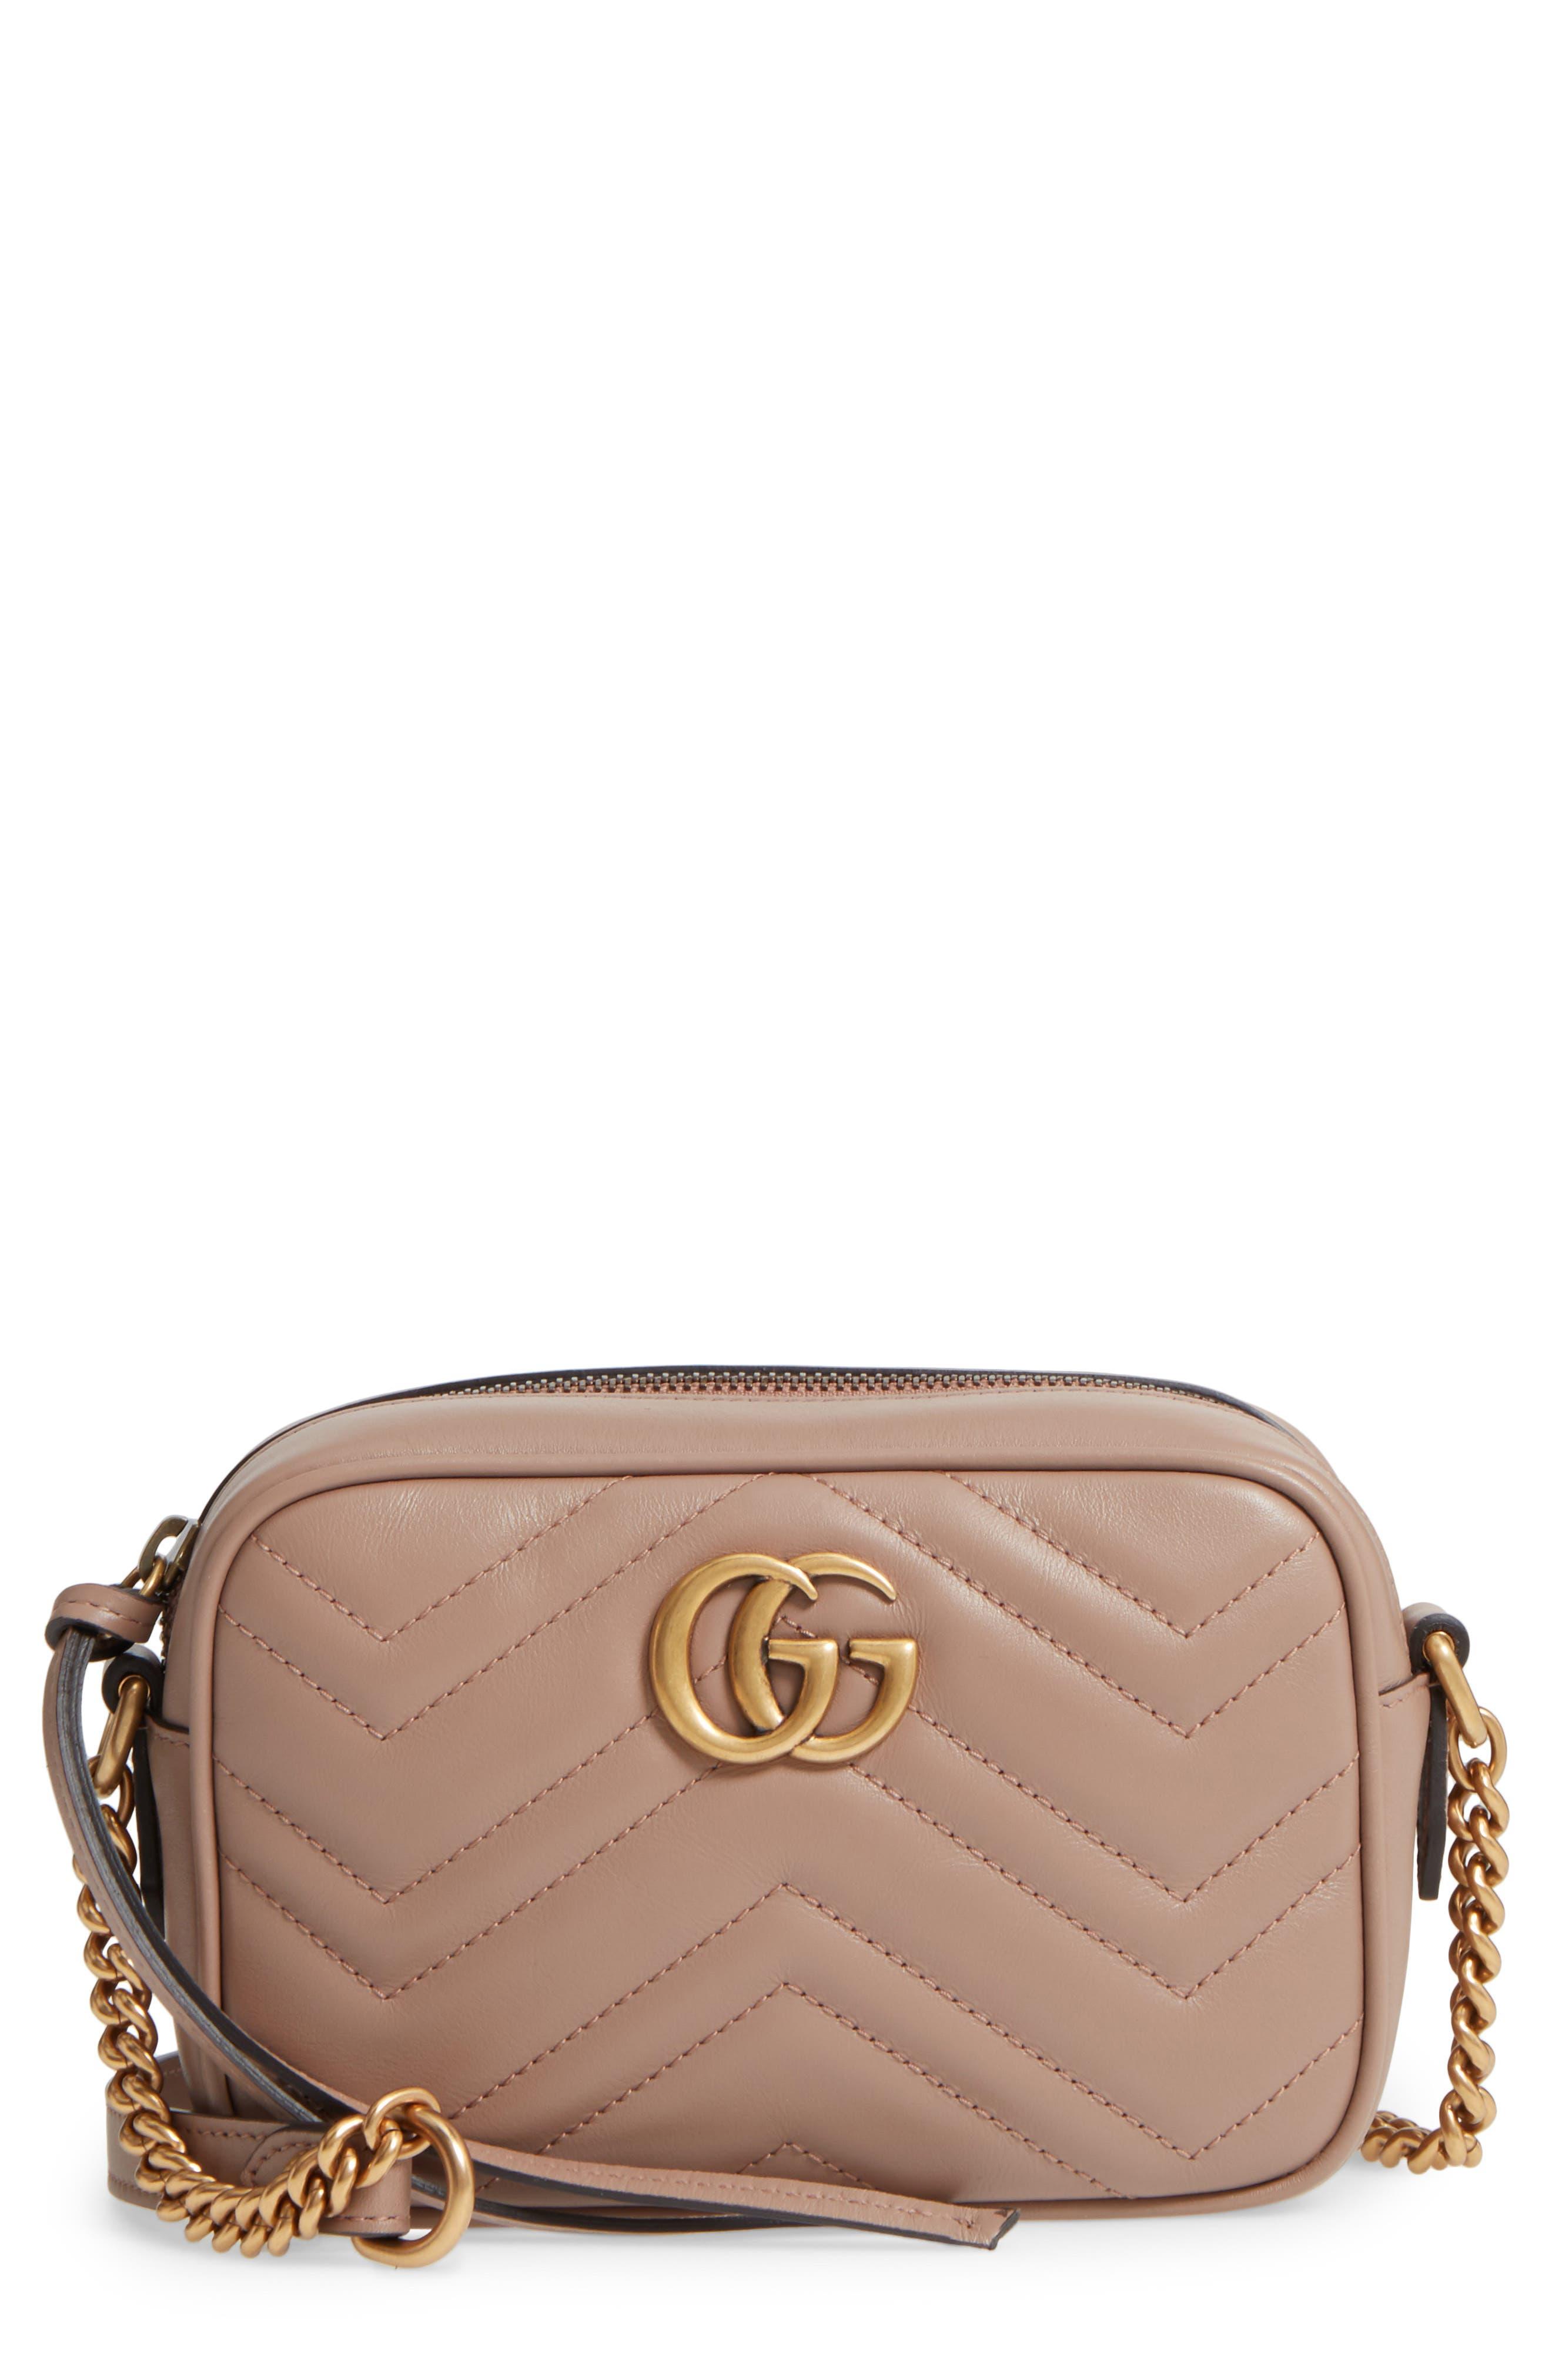 Gucci GG Marmont 2.0 Matelassé Leather Camera Bag